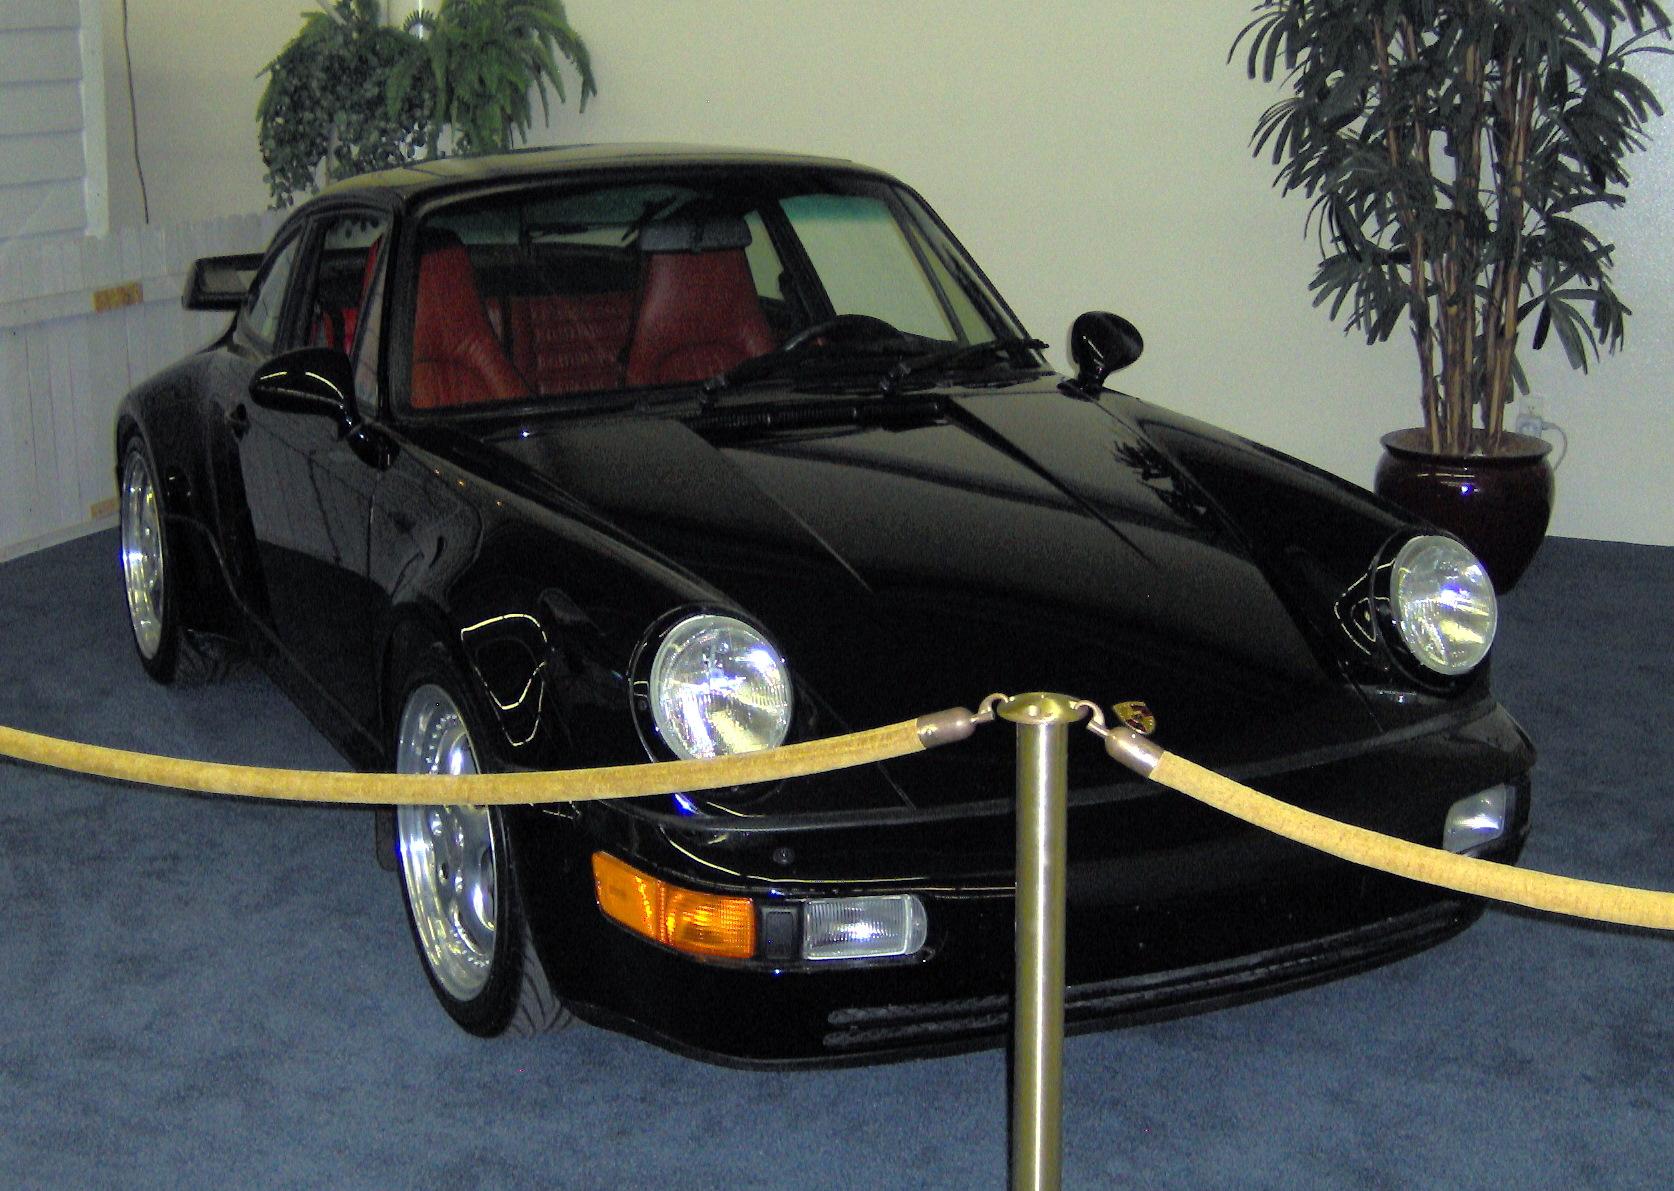 Porsche 911 3.6 Turbo